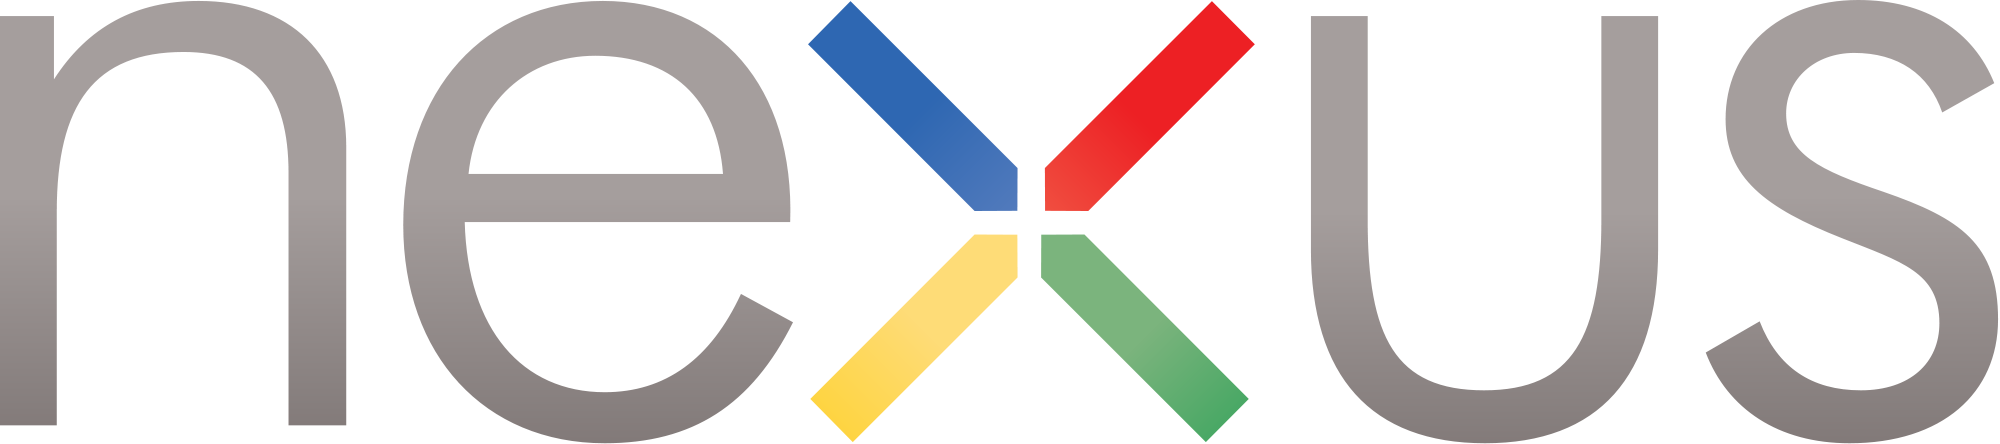 google-nexus-w2000